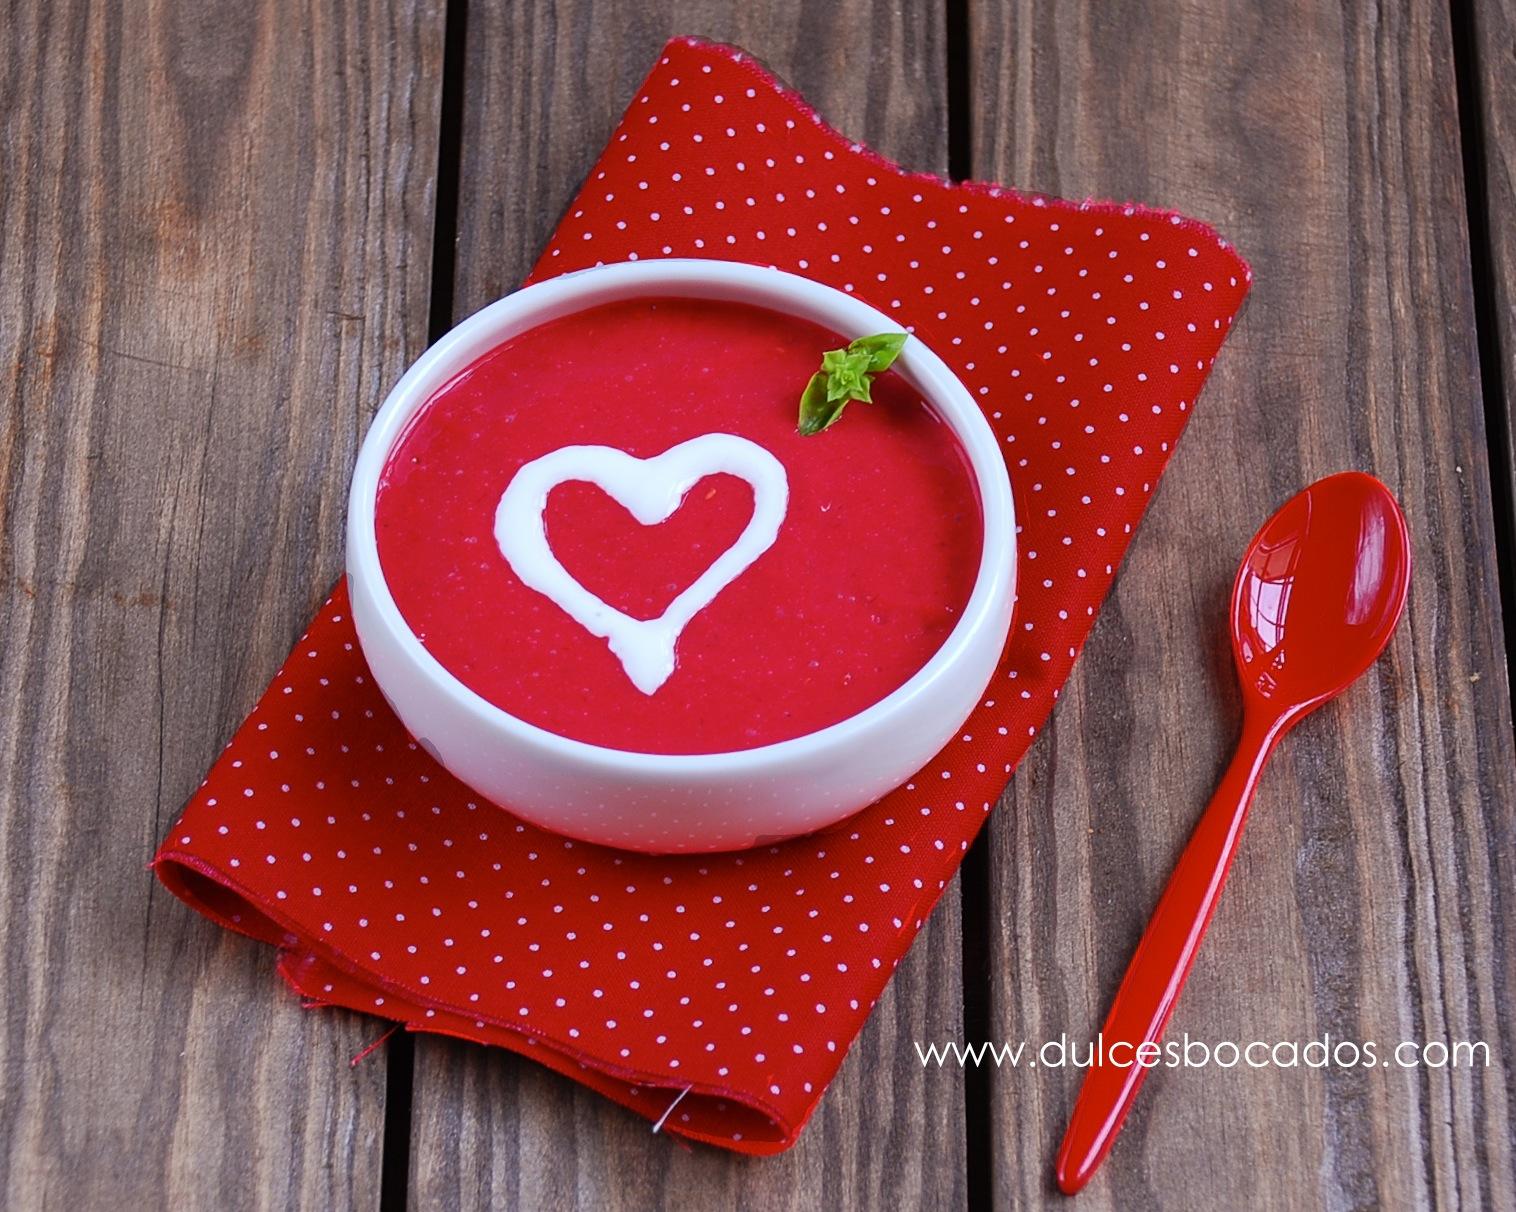 Sopa de frambuesa - San Valentin - Dulces bocados